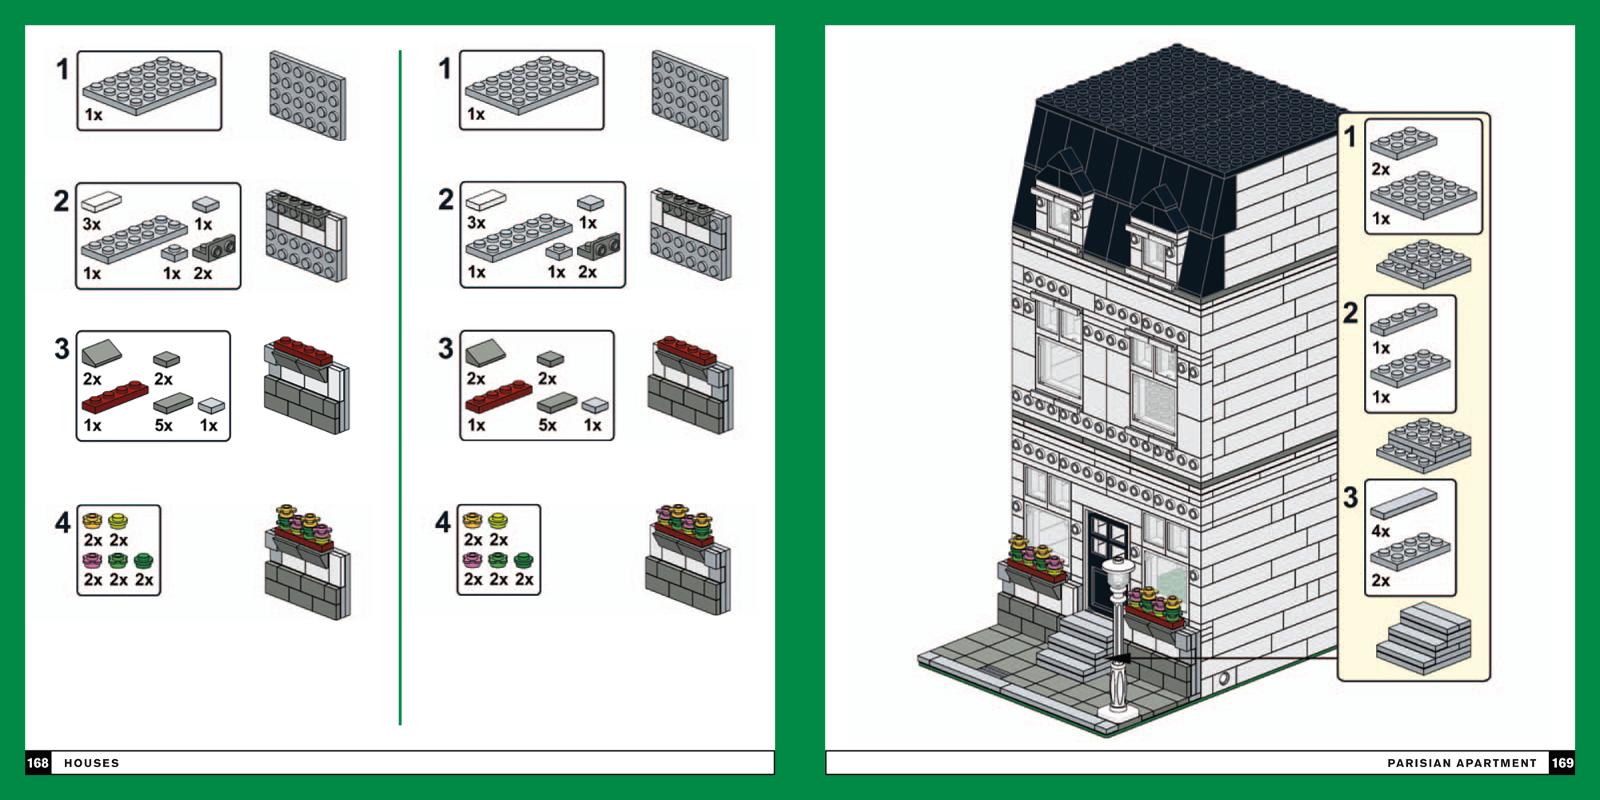 Modular LEGO instructions